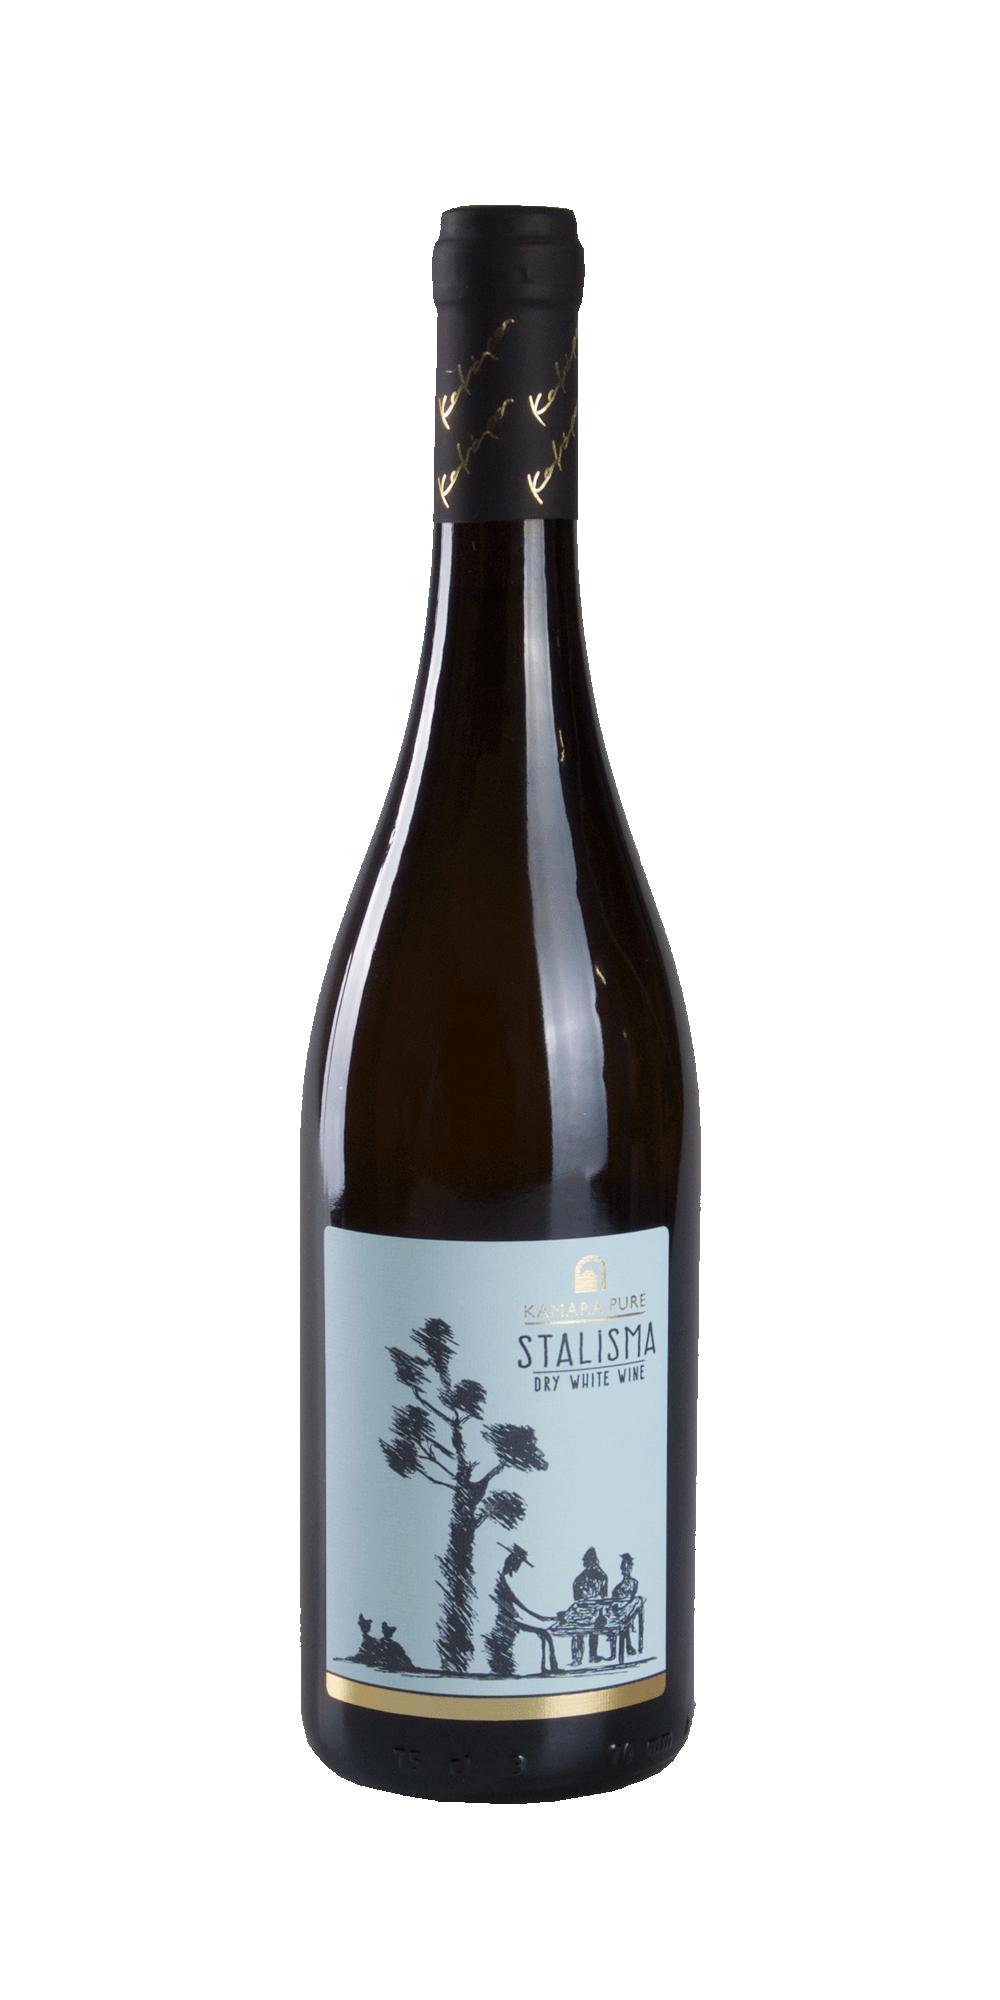 Stalisma Malagousia Eclectique BIO 2020 - Kamara Winery